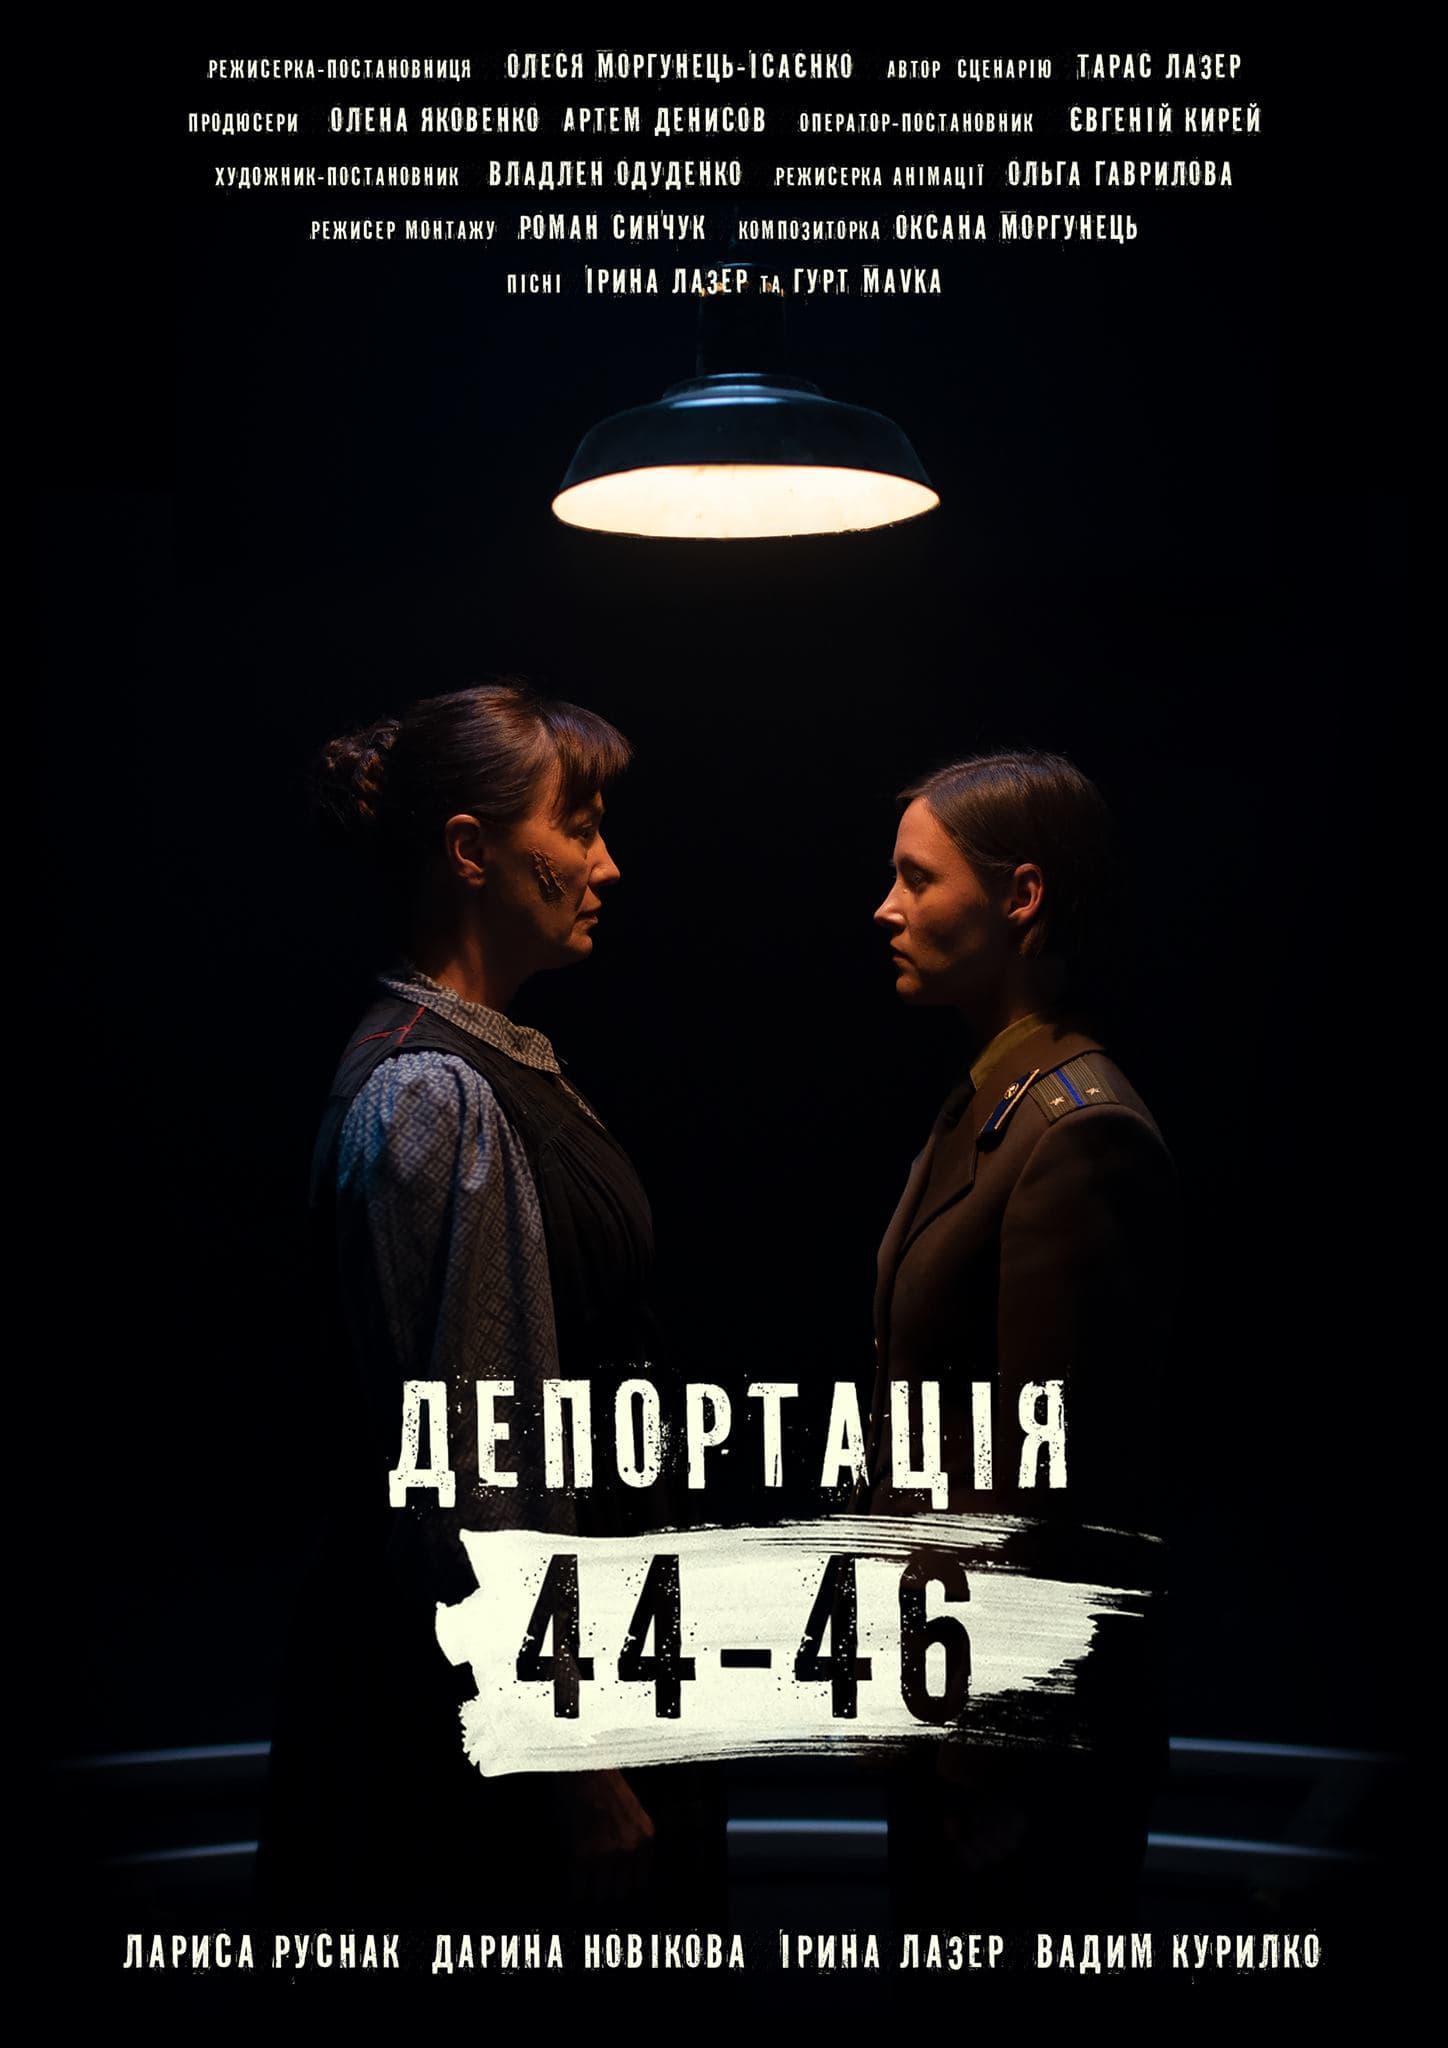 Депортація 44-46